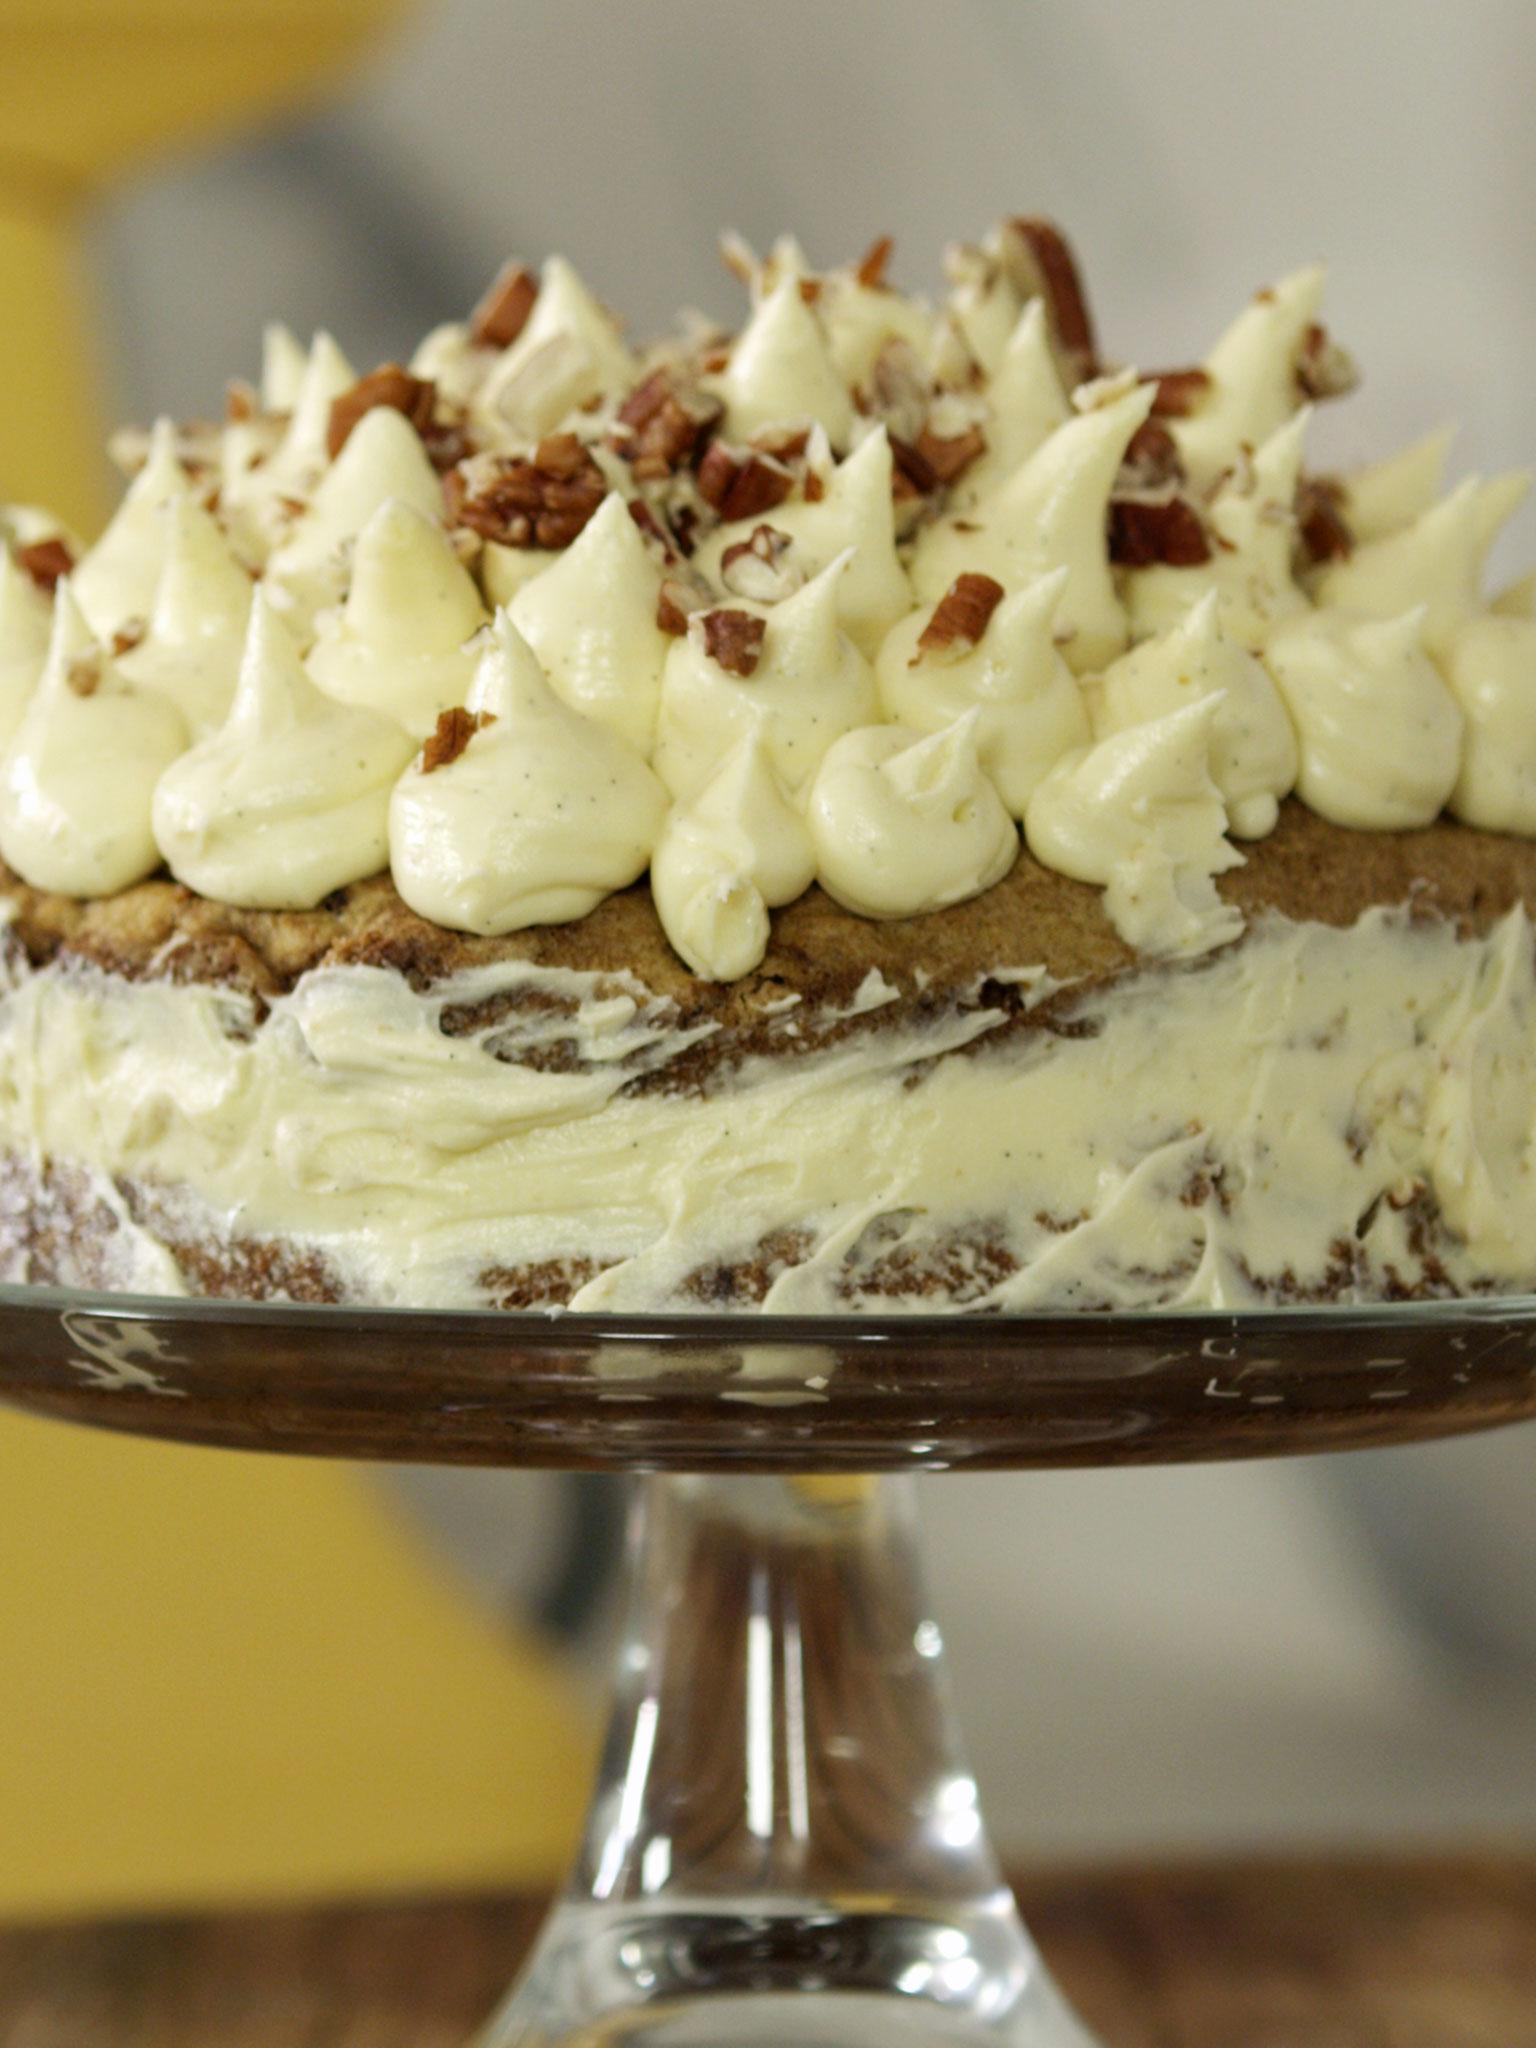 2-066-Jimmys-Carrot-Cake-web.jpg